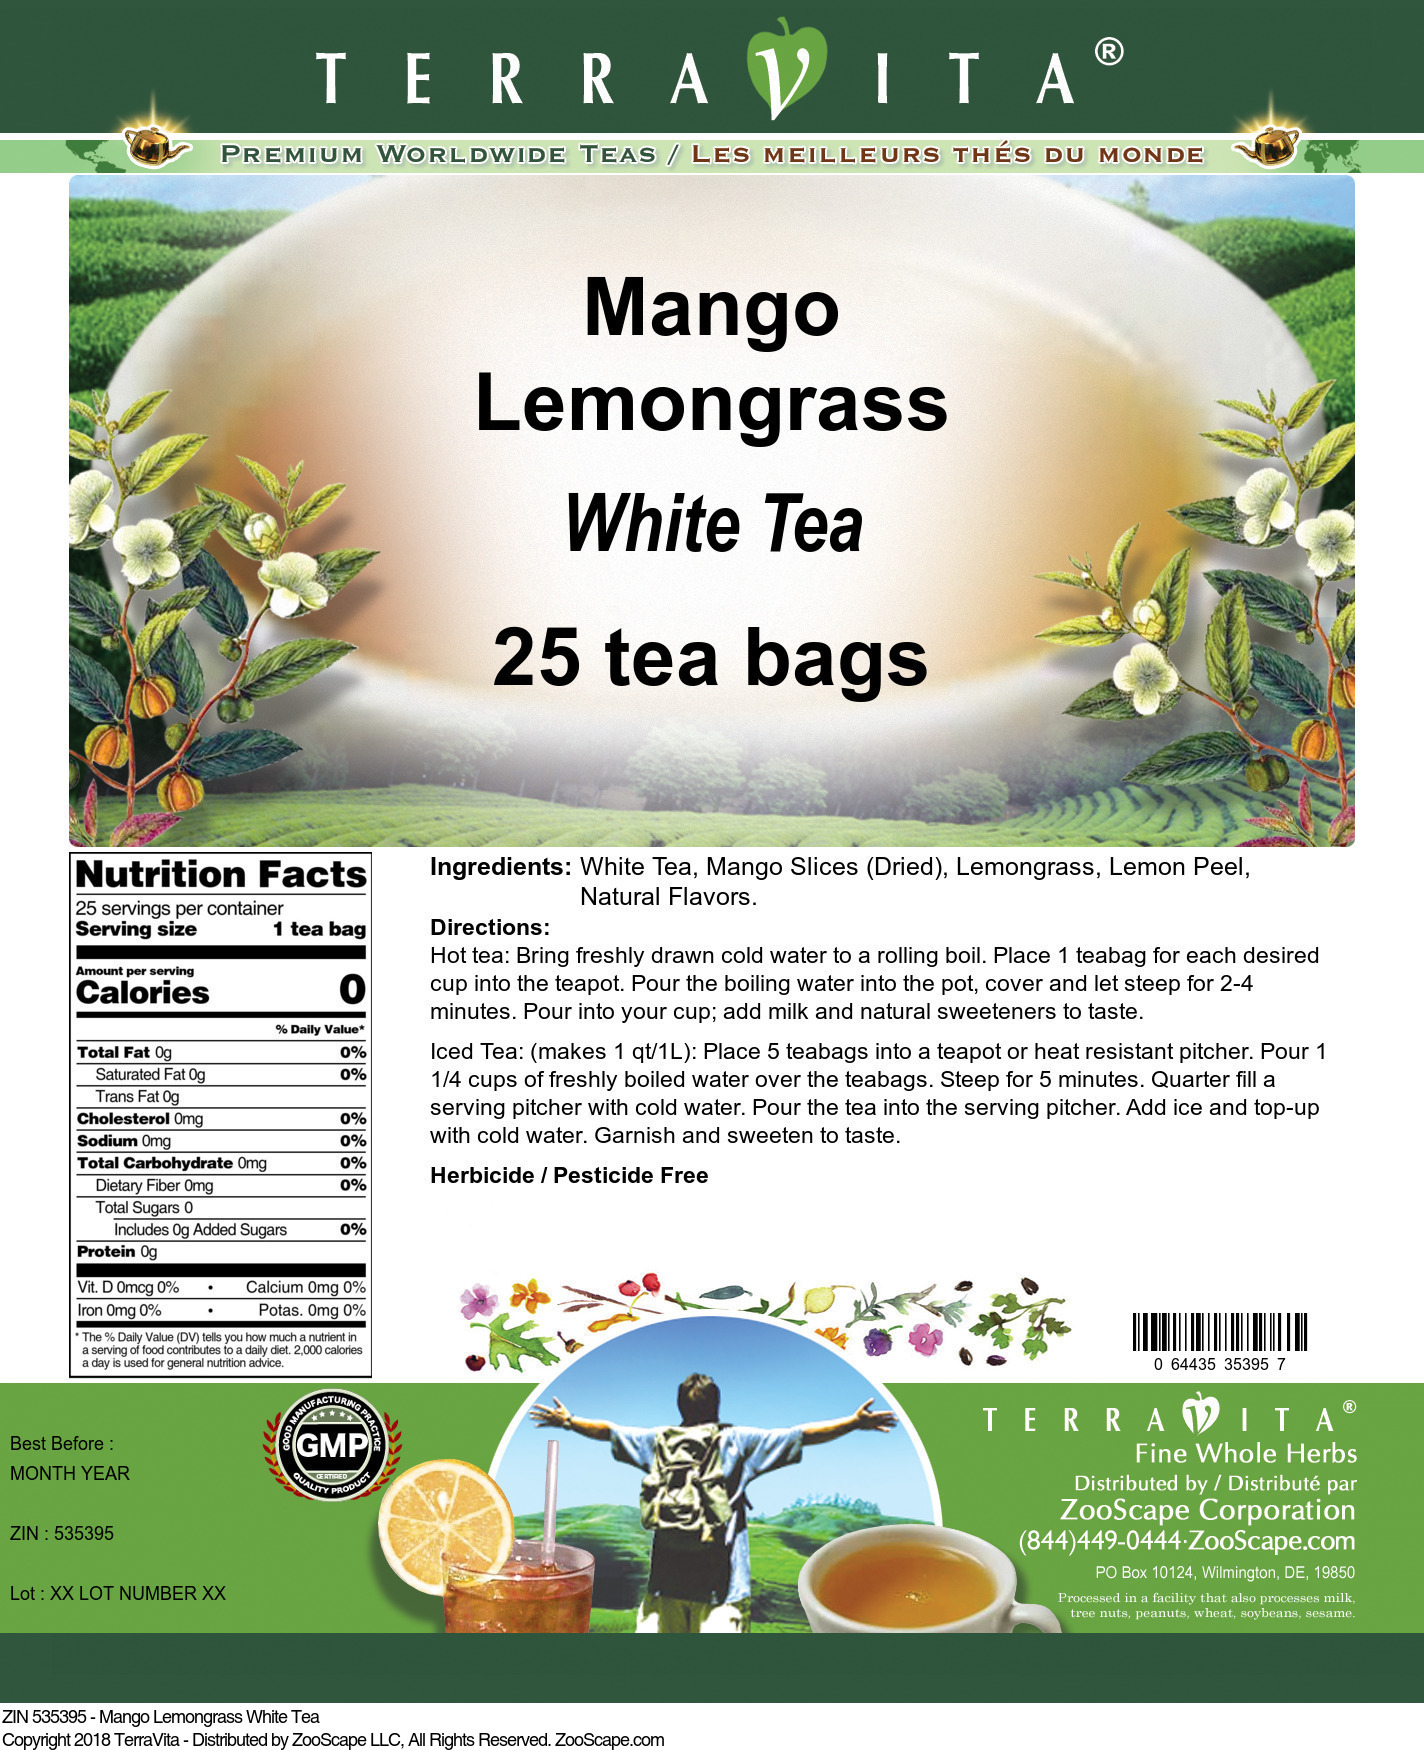 Mango Lemongrass White Tea